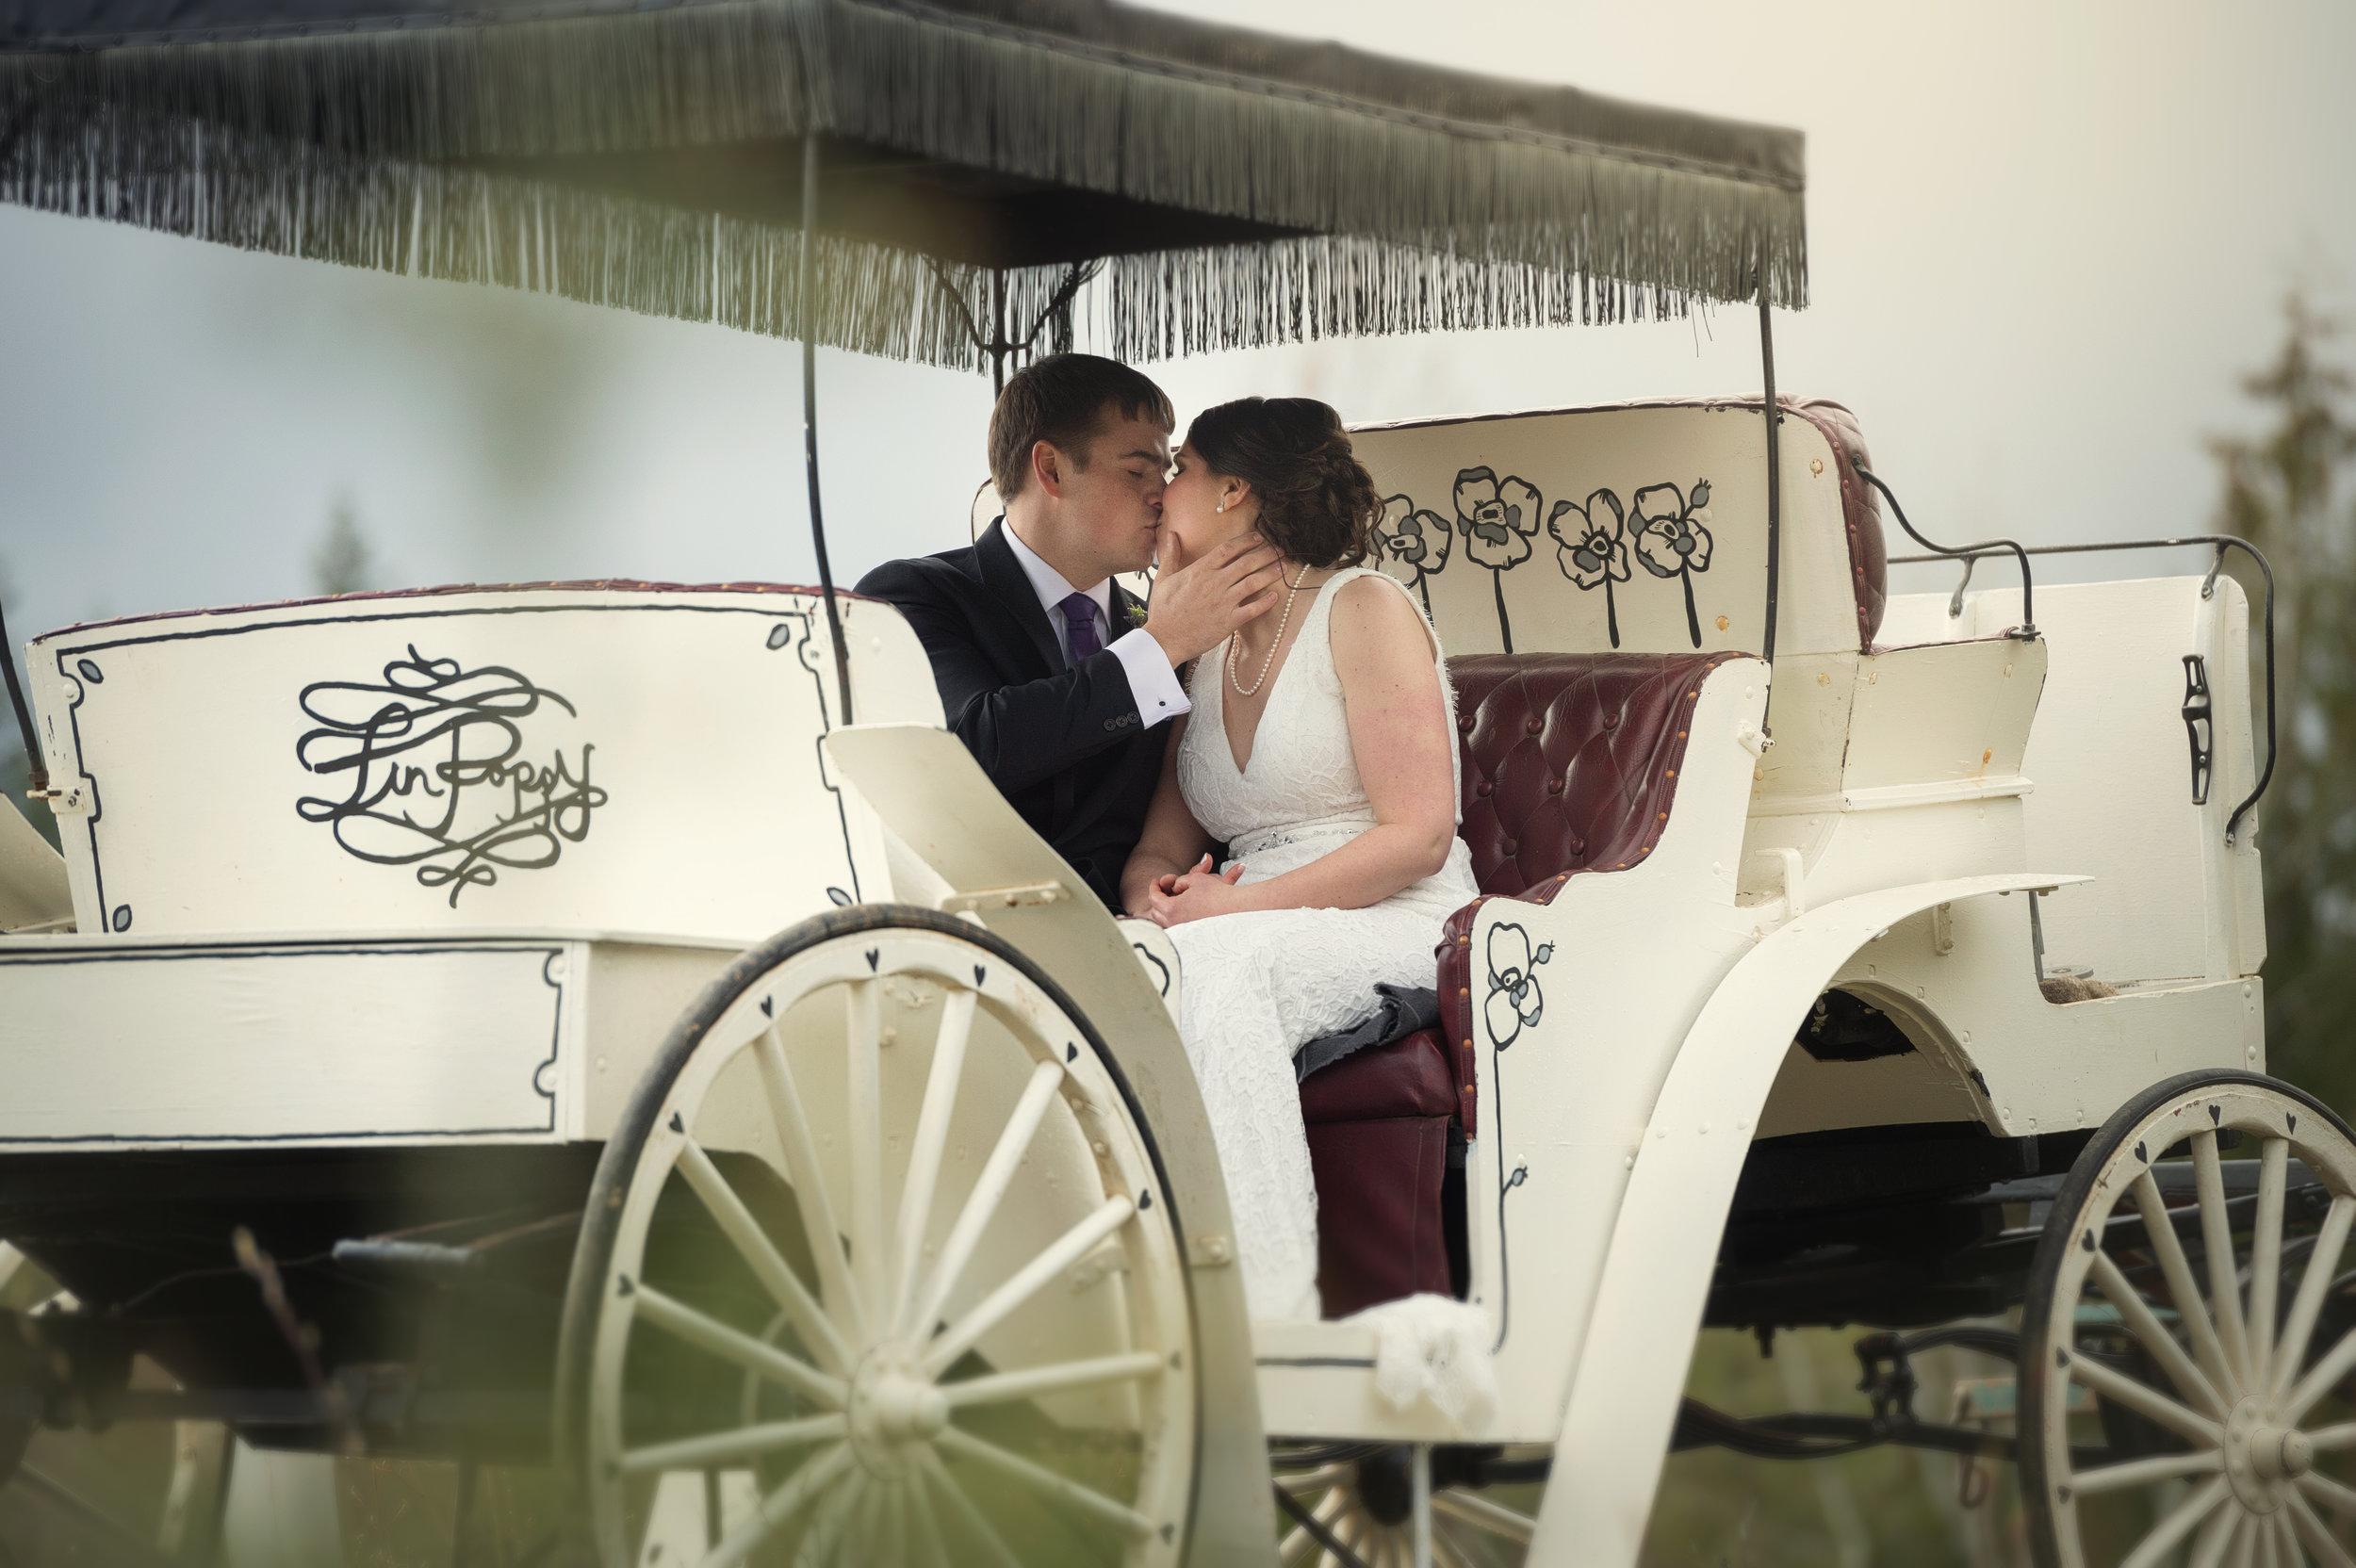 Romantic Elopement at Tin Poppy Retreat in British Columbia 10.jpg